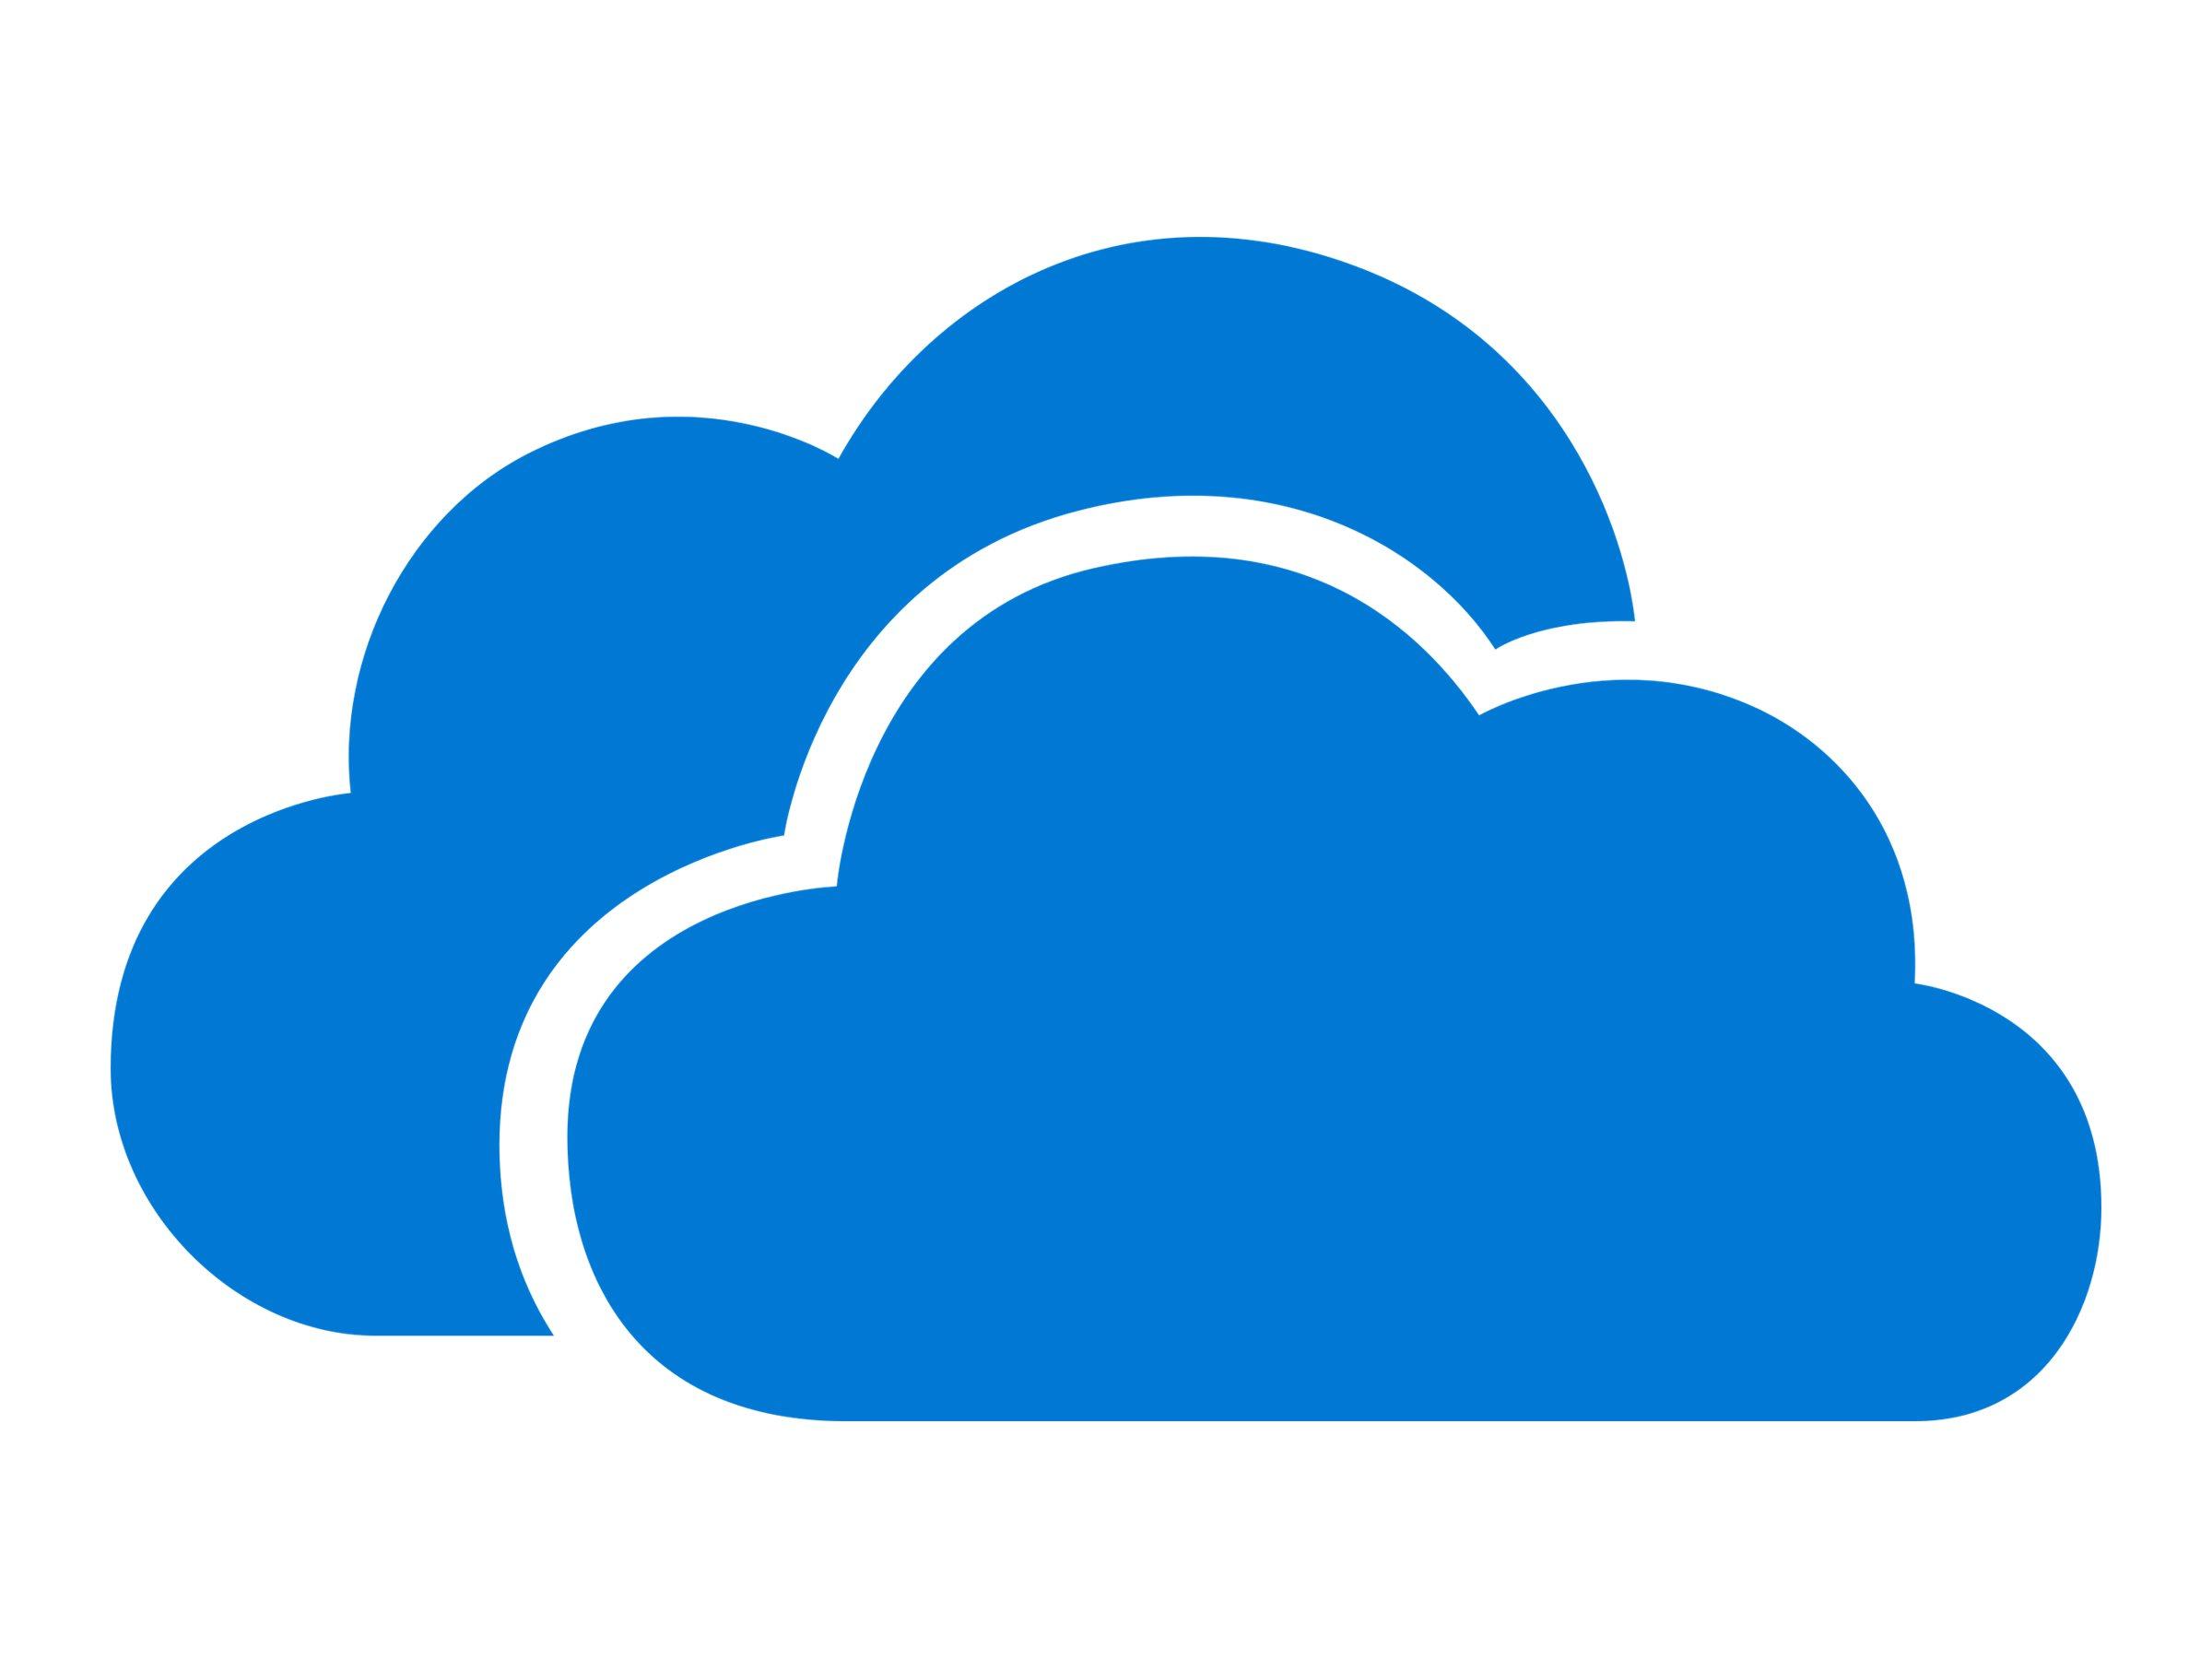 OneDrive for Business - Abonnement-Lizenz (1 Monat) - 1 Benutzer - CSP - Win, Mac, Android, iOS, Windows Phone - mit Office Onli